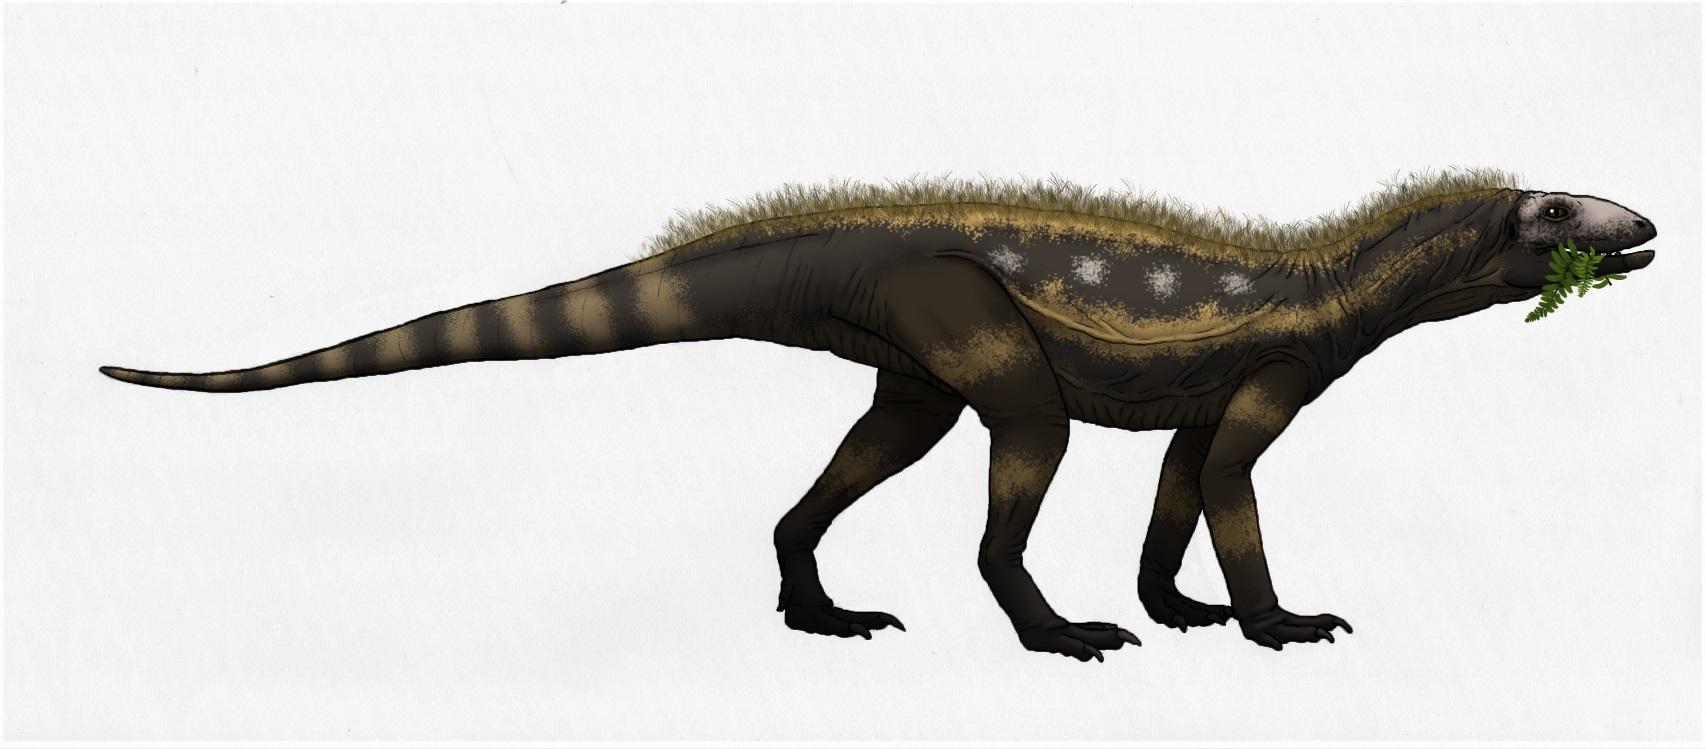 Kwanasaurus